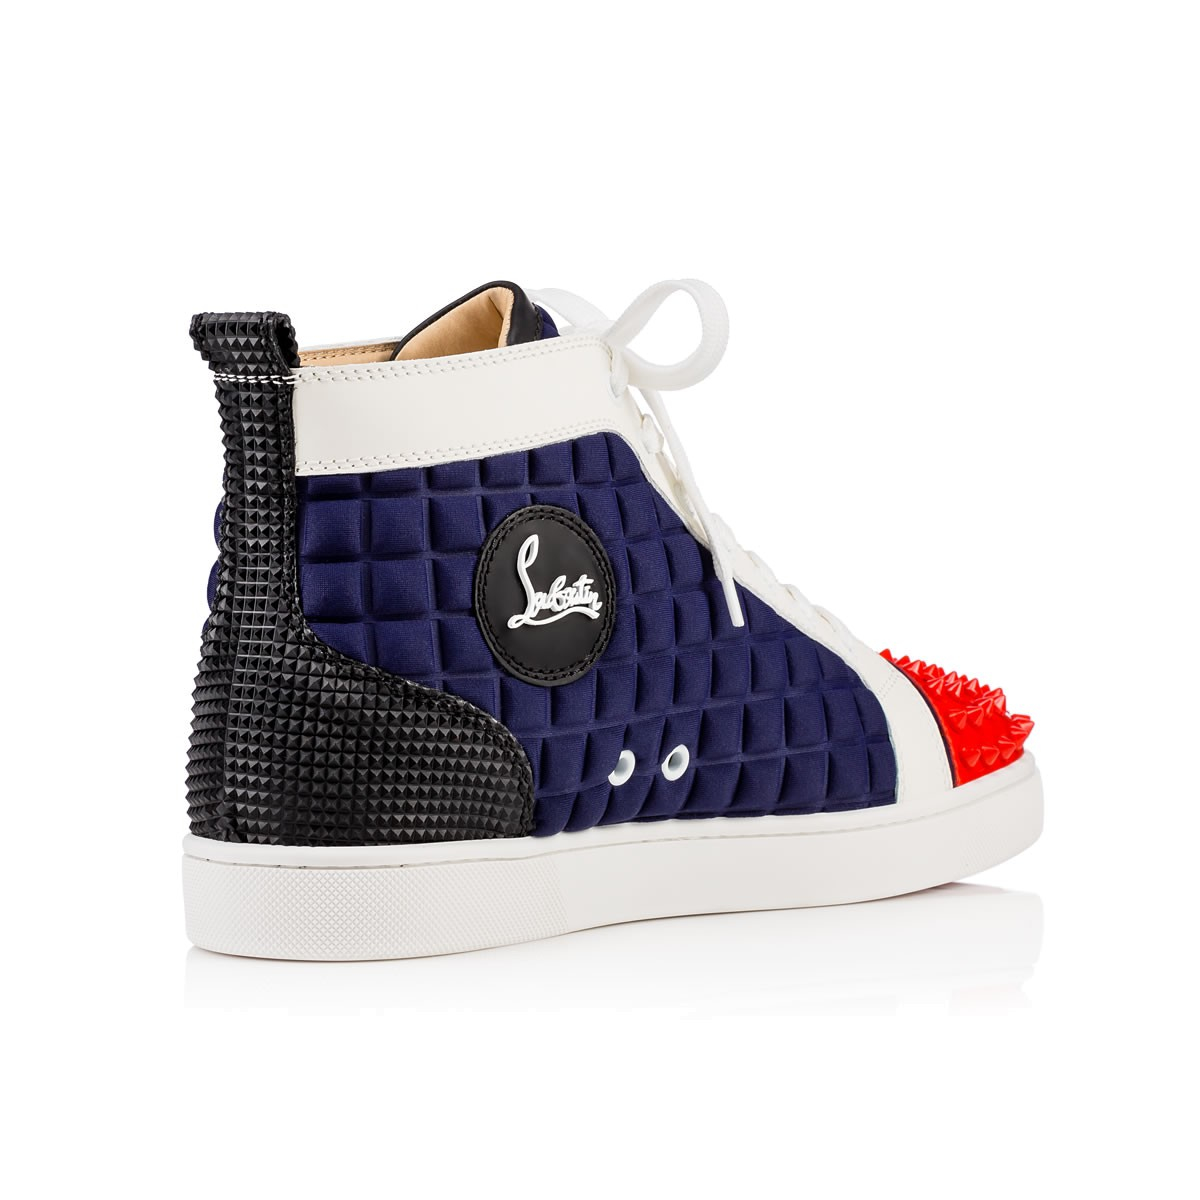 Lyst - Christian Louboutin Lou Spikes Neoprene High-Top Sneakers in Blue  for Men